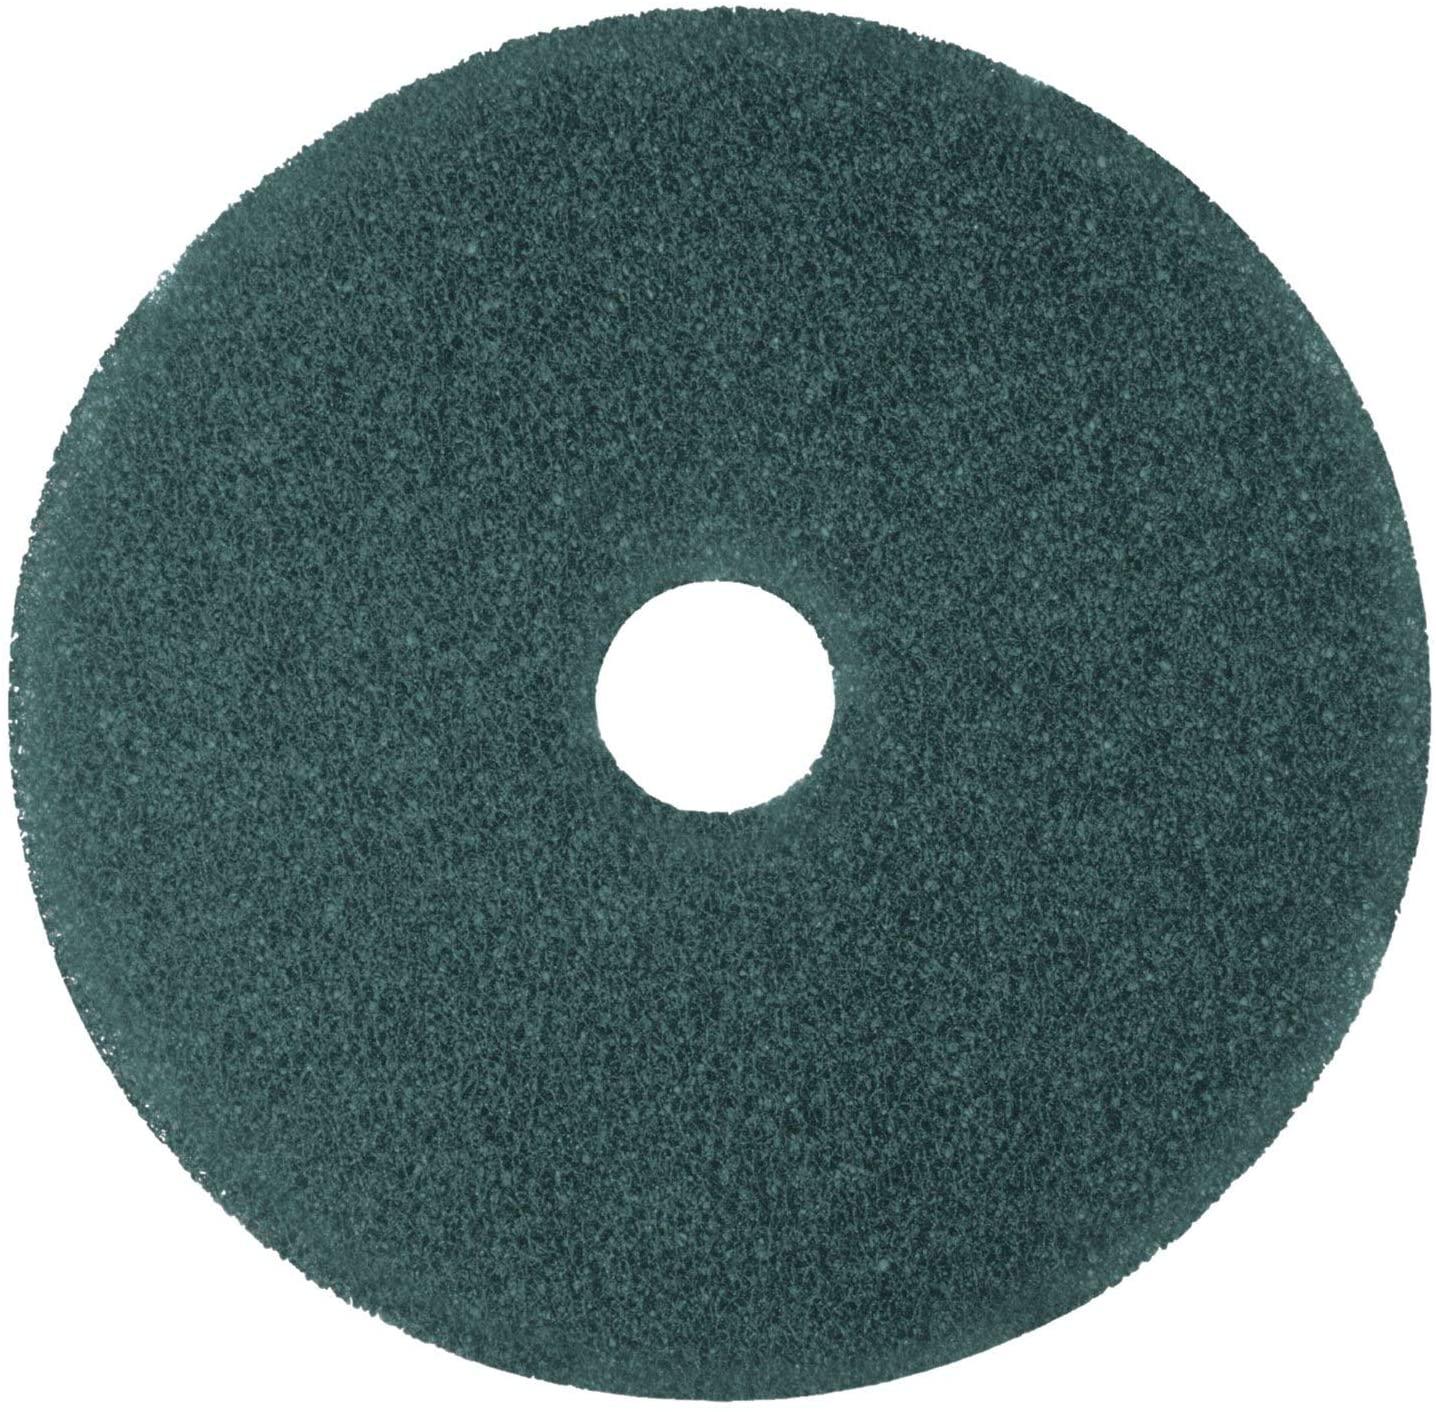 3M Cleaner Floor Pad 5300, 13